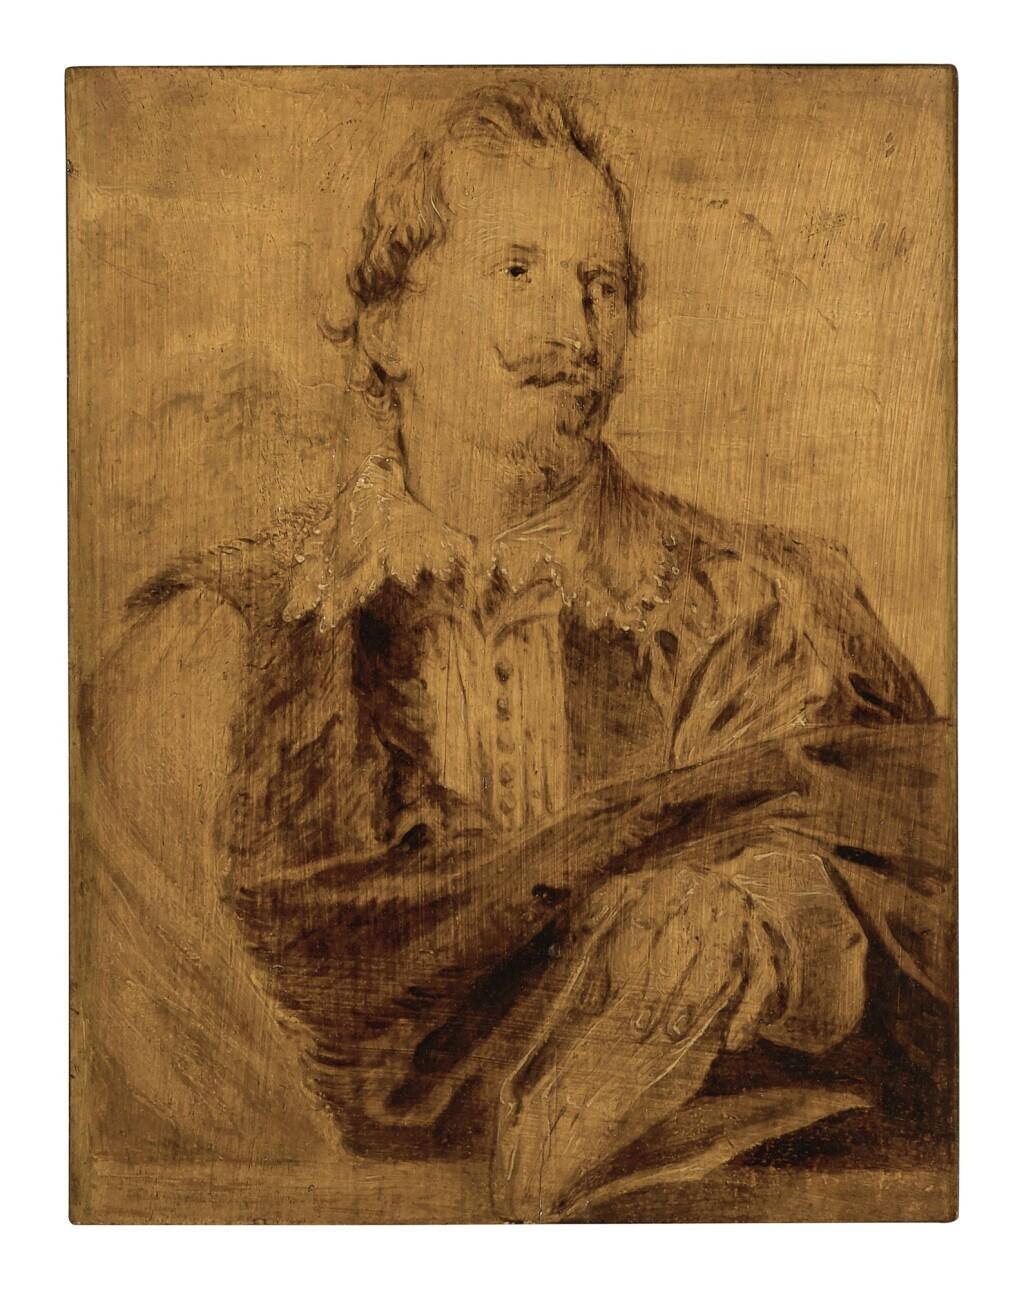 CIRCLE OF SIR ANTHONY VAN DYCK   PORTRAIT OF JEAN-GASPARD GEVAERTS (1593-1666)